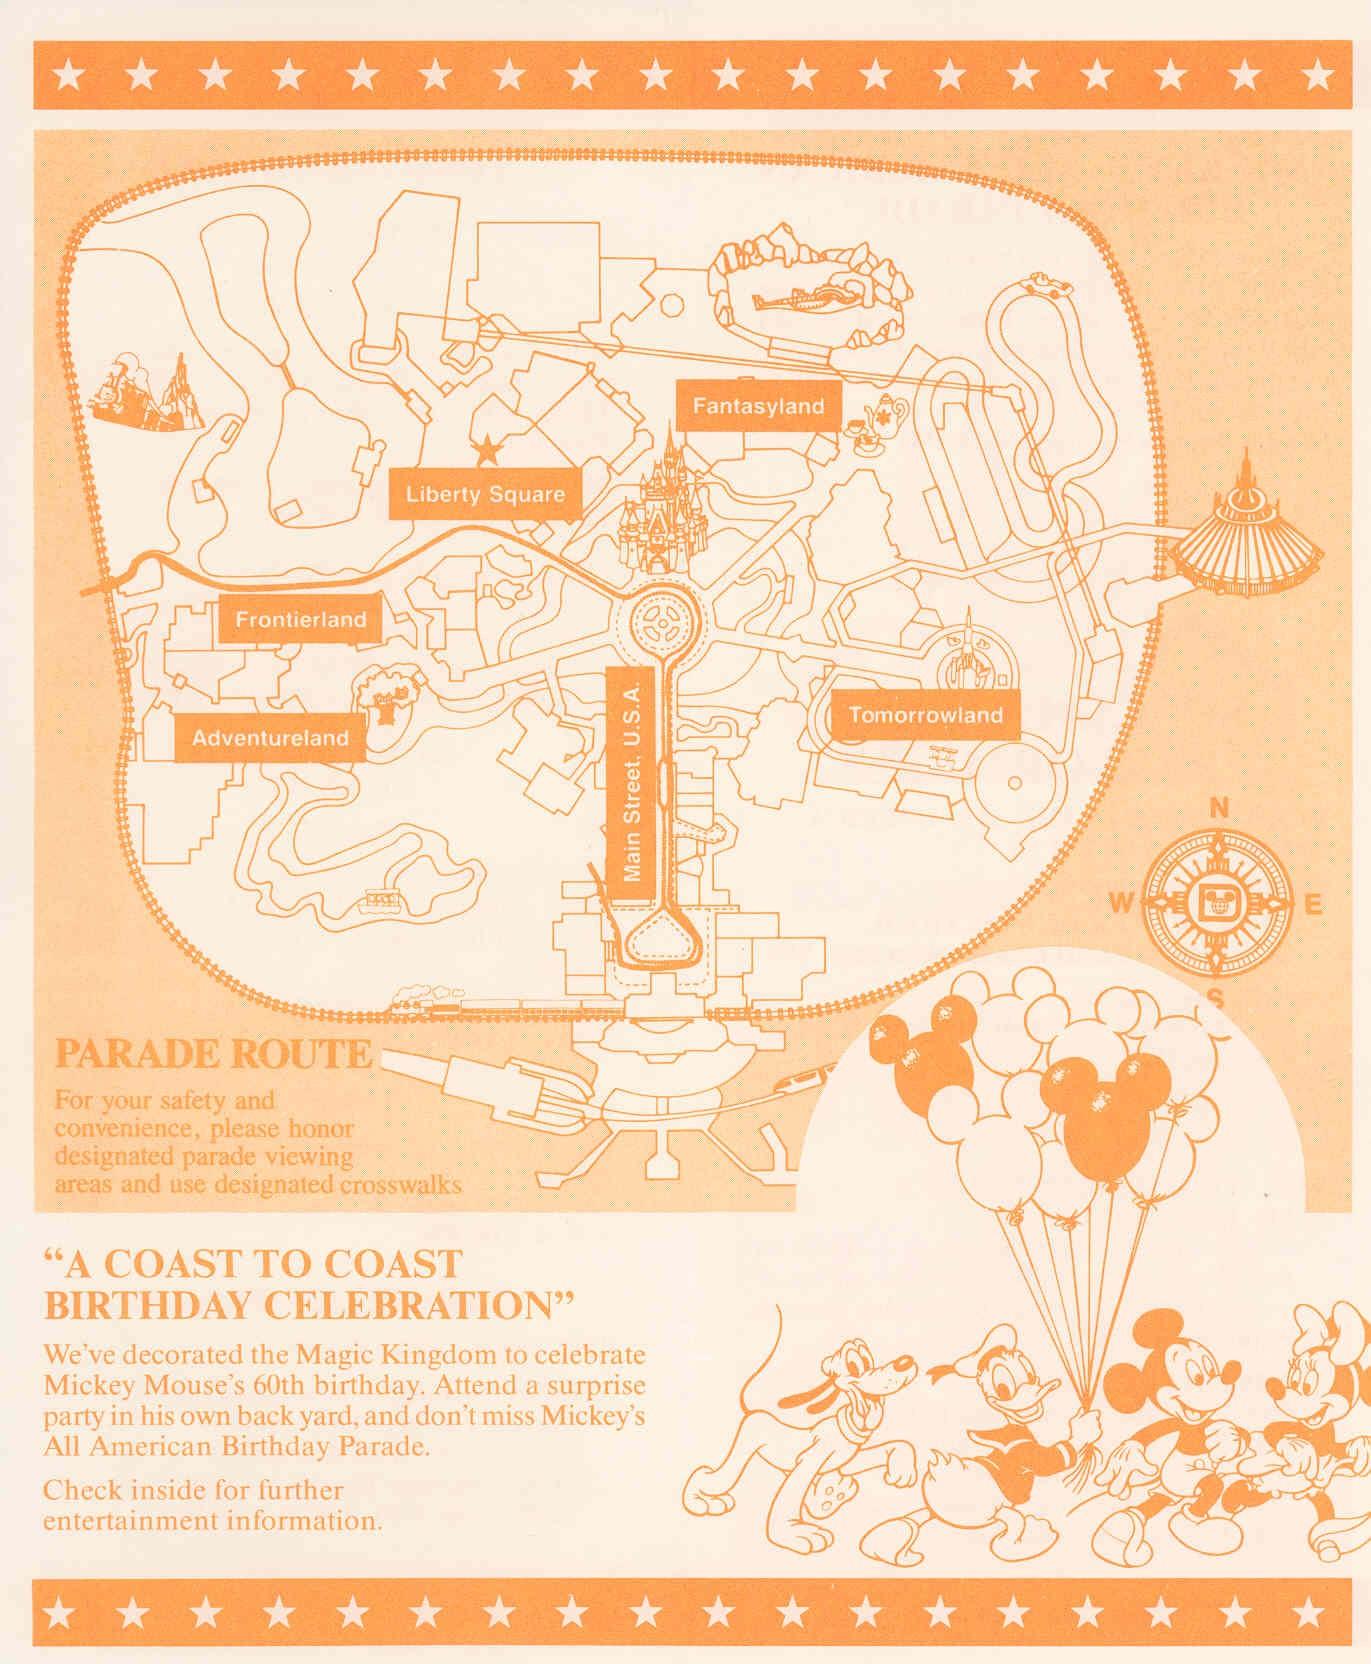 Magic Kingdom Show Guide 1989